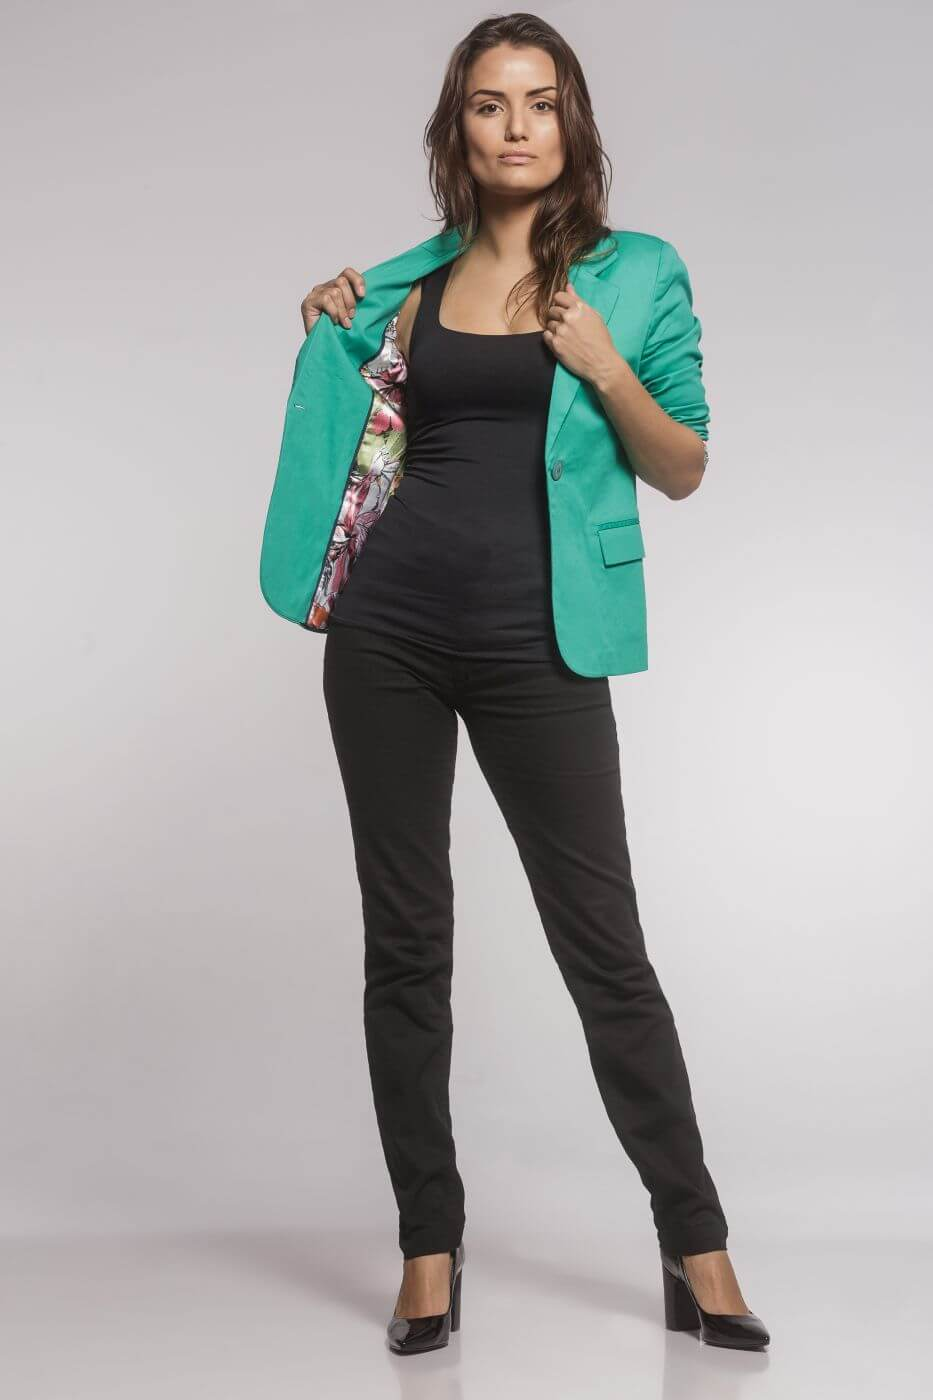 Blazer Feminino Clássico Sarja Verde Esmeralda